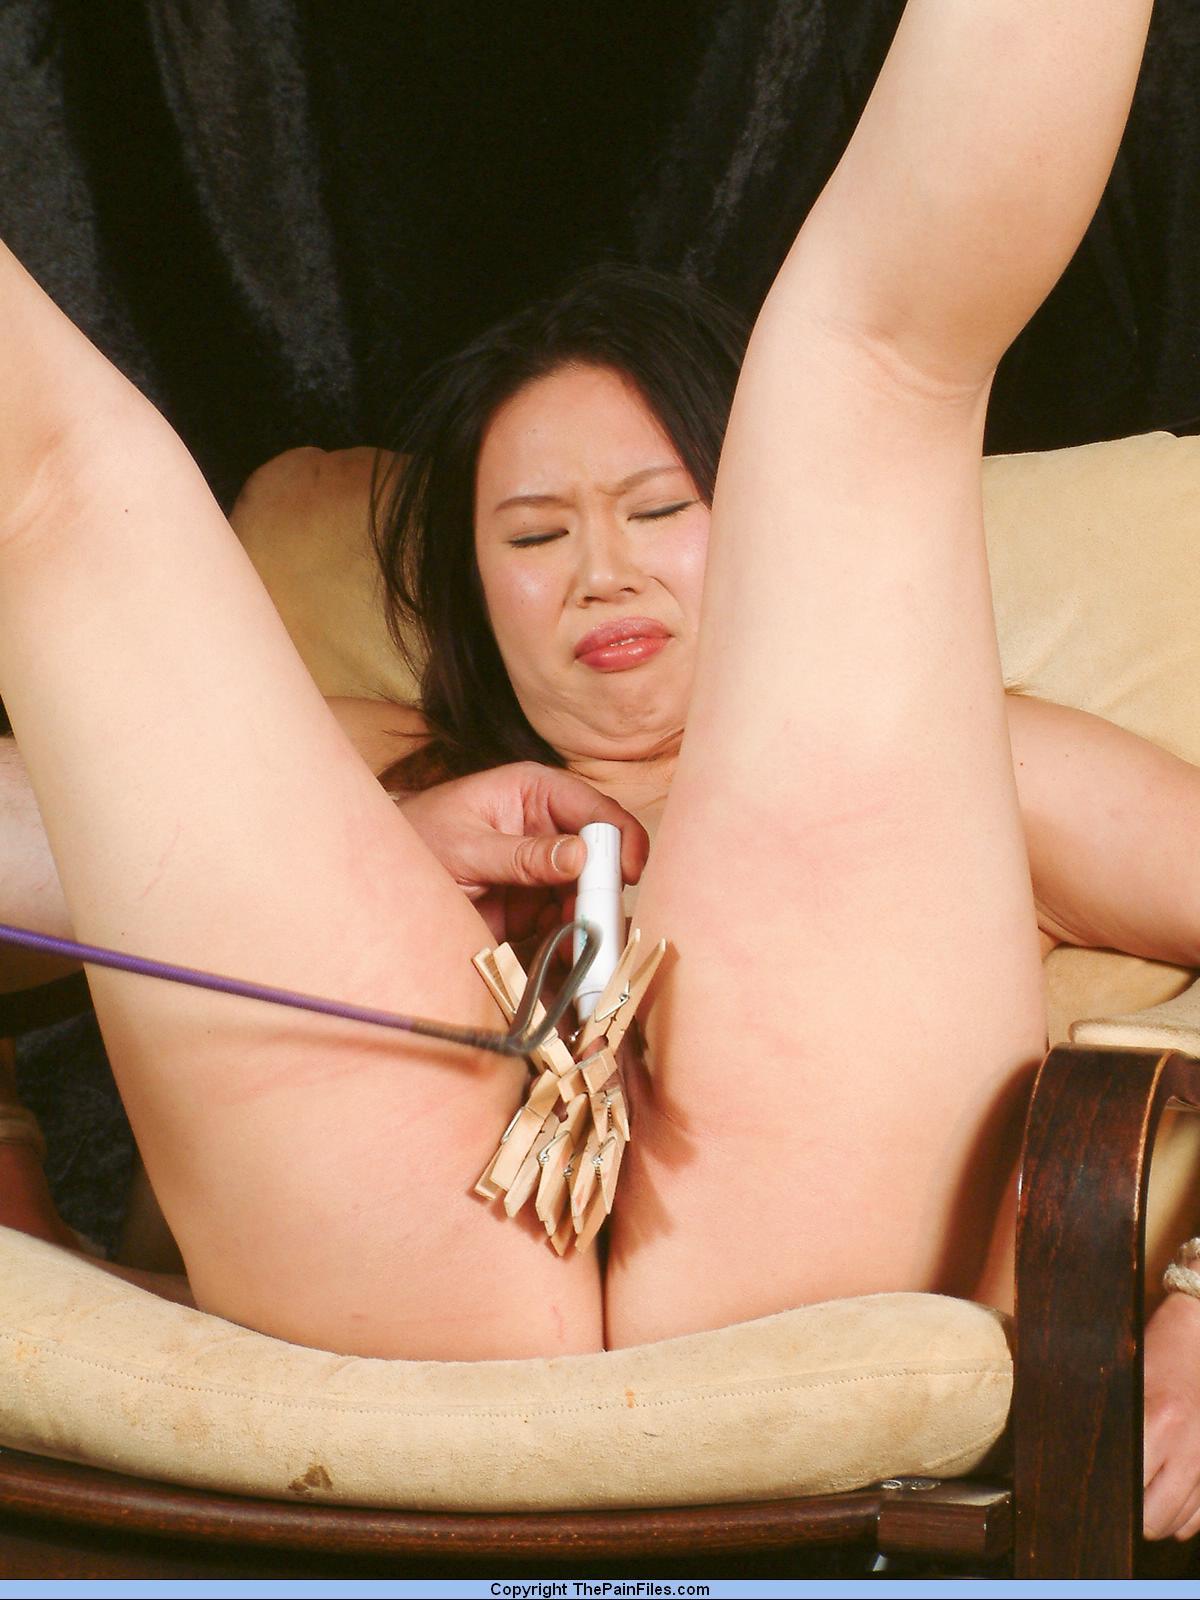 Sadomaso Sex In Japan featuring pussy spanking of Tigerr Benson